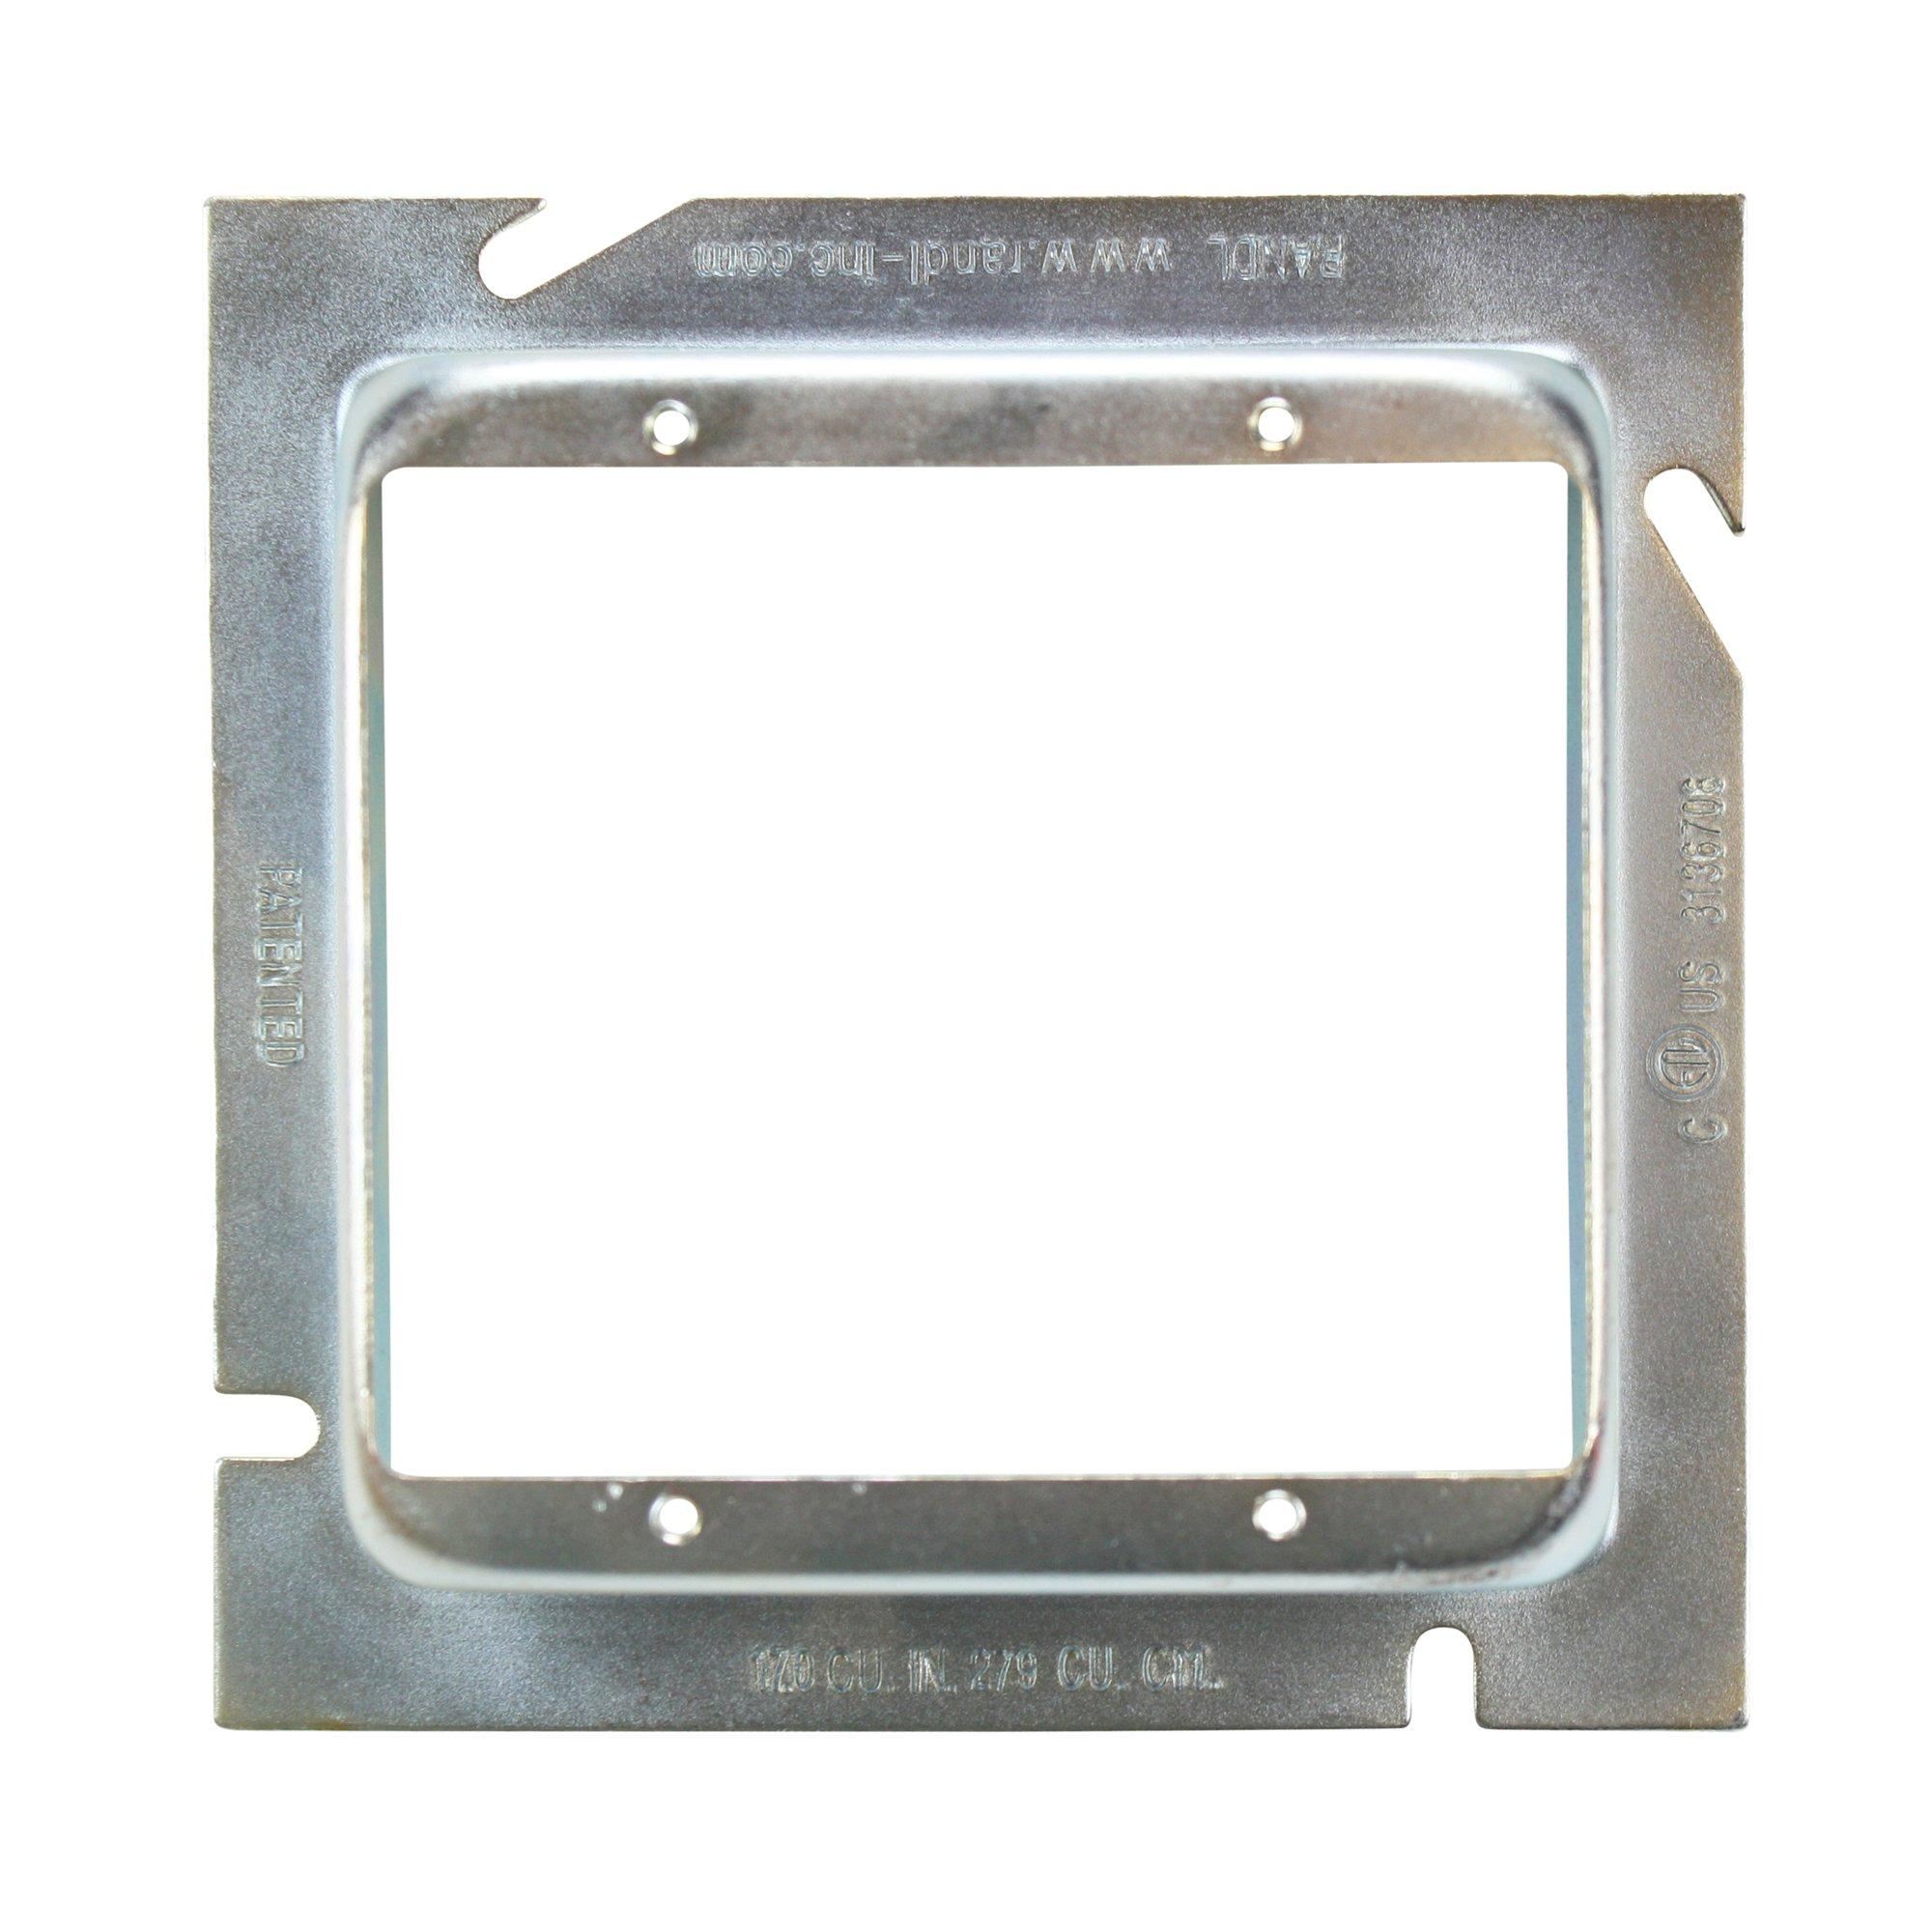 Randl L-52G114 5'' Square Telecommunication 2-Gang Extension Ring (10 Pack)